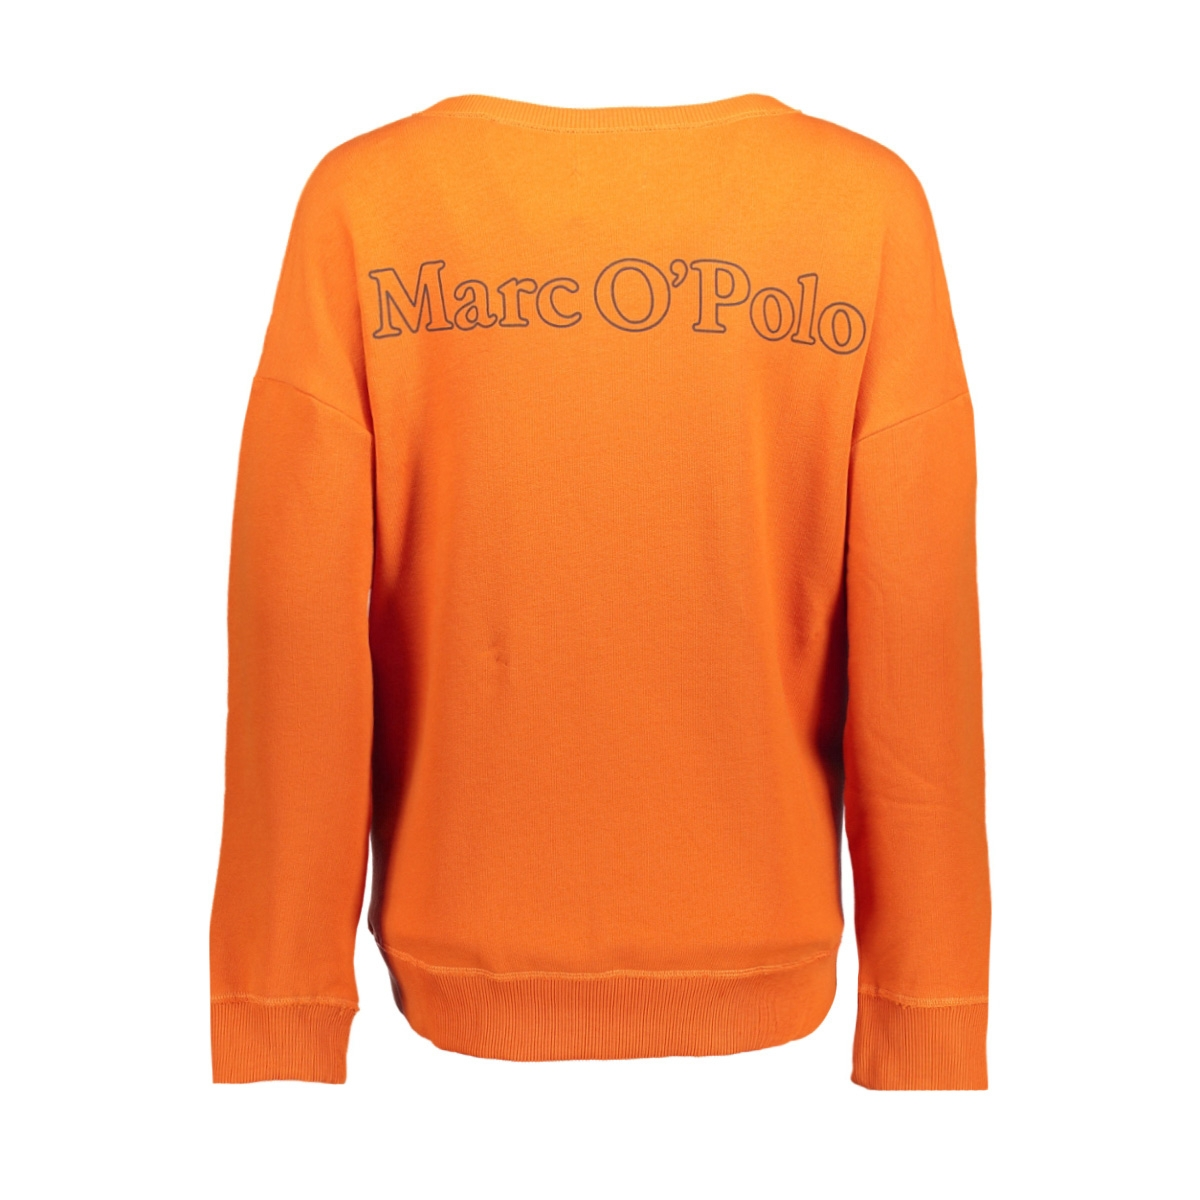 708 4129 54067 marc o`polo sweater 313 pumpkin seed